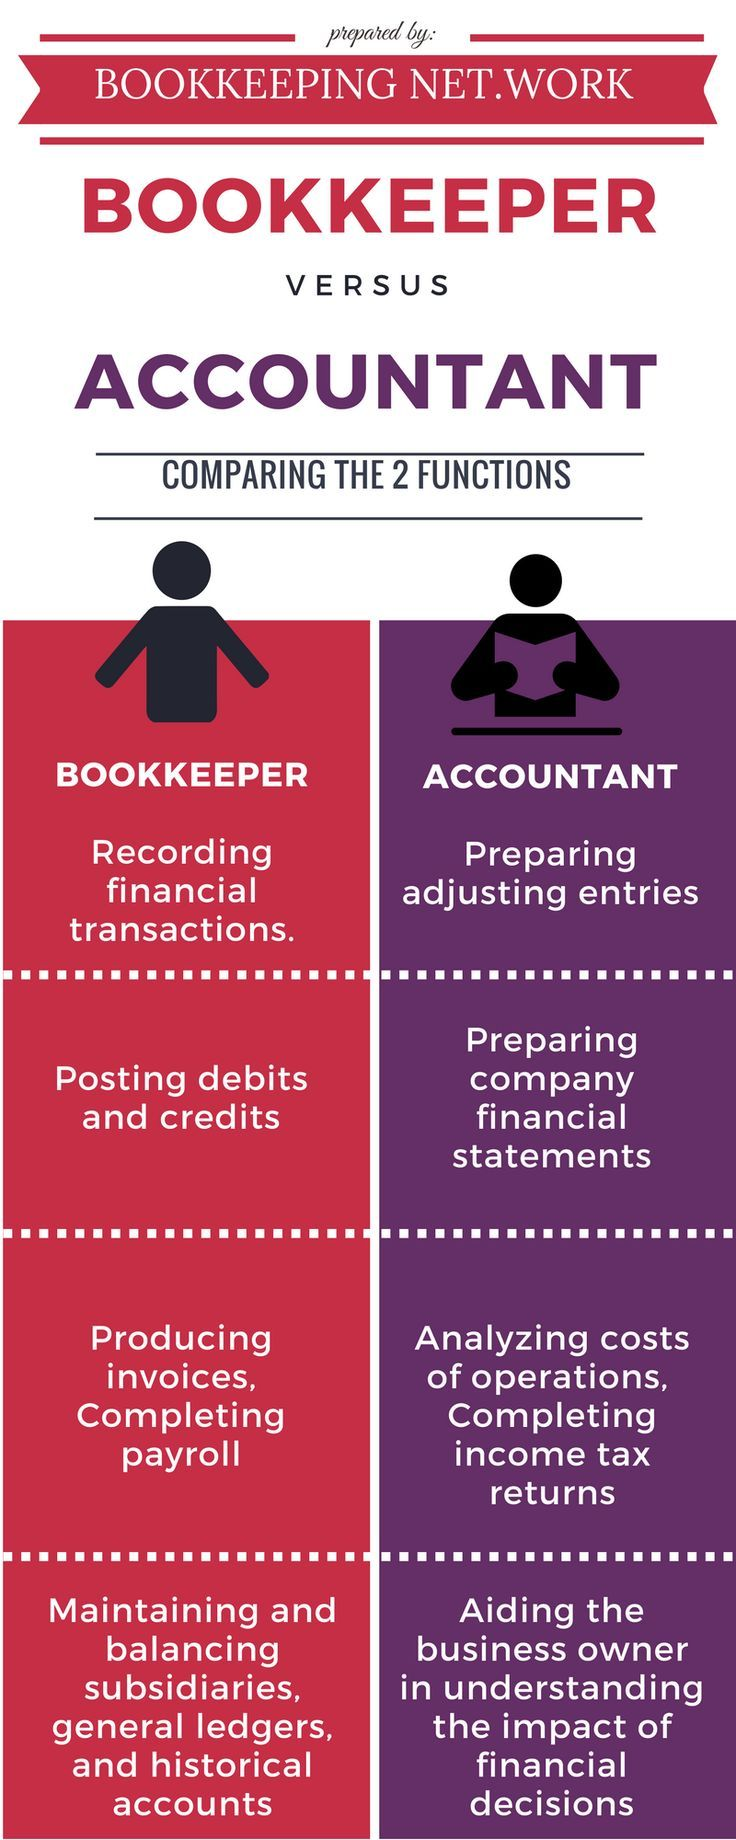 Bookkeeper Infographic, Accountant Infographic Bookkeeper vs Accountant Comparing the 2 functions http://brendanaska.wixsite.com/bookkeepingnetwrk